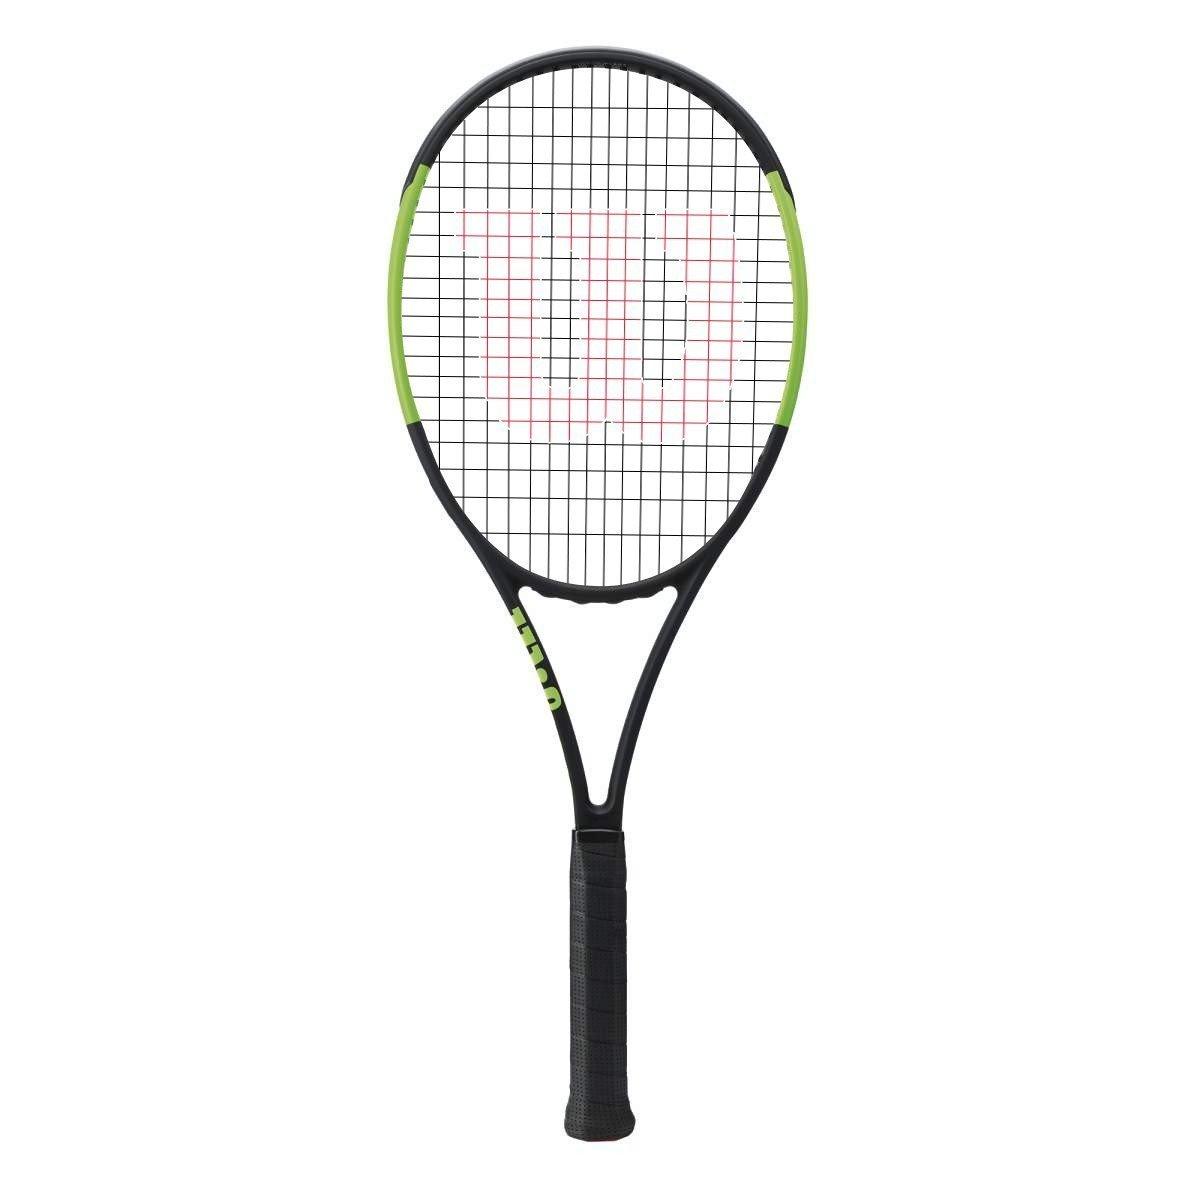 Wilson Blade 98 18 x 20 CV (Countervail) グリーン/ブラックテニスラケットStrung withカスタムラケット文字列色 B076DVZ4Y1 4 3/8 inch|Natural String Natural String 4 3/8 inch